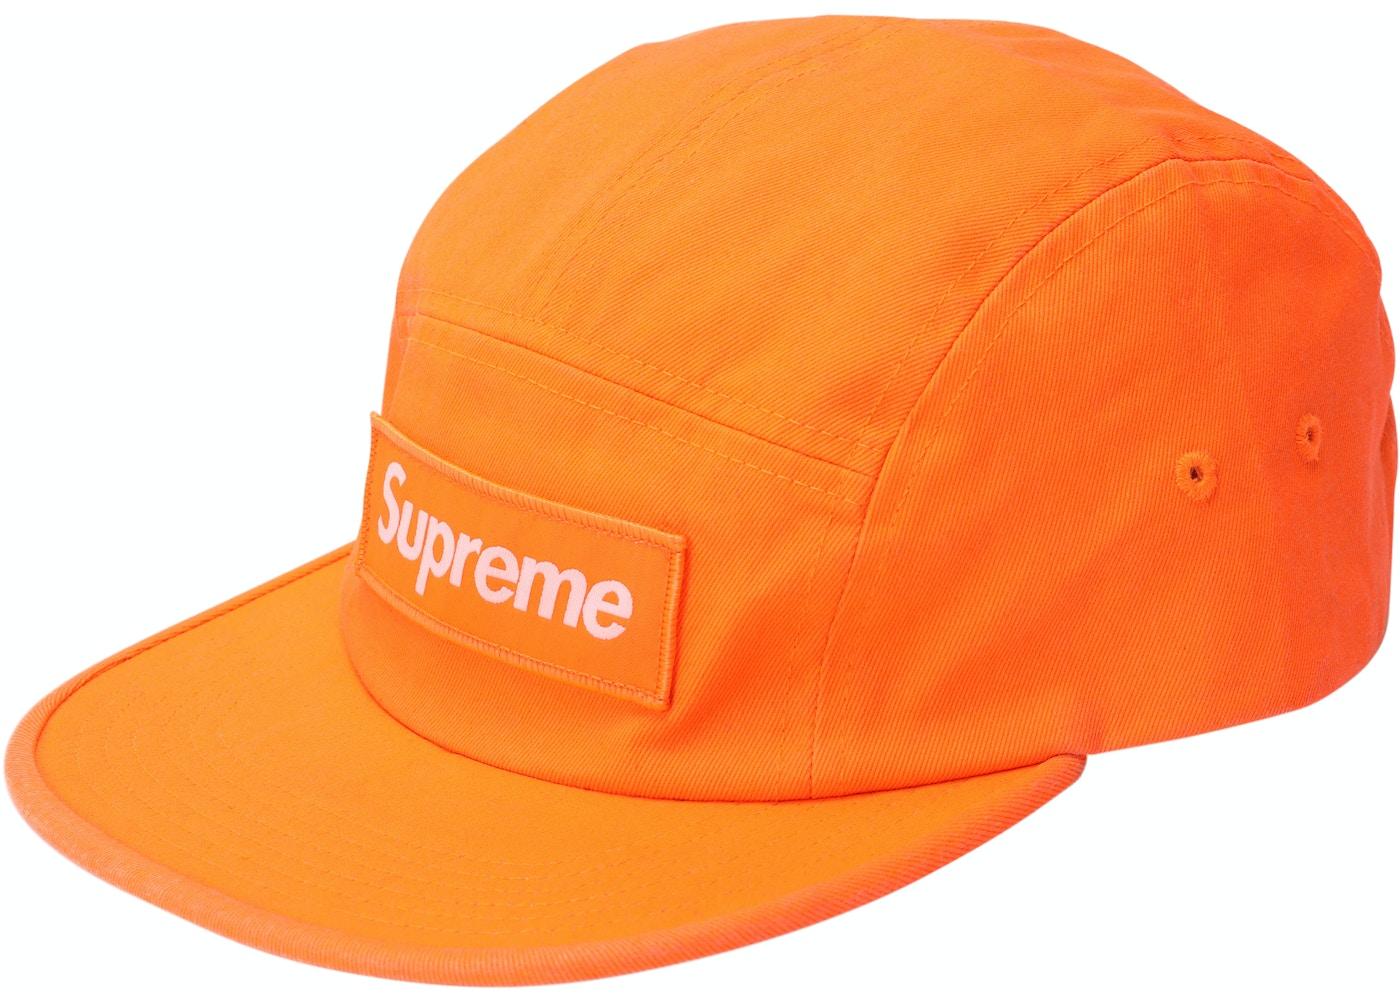 85e4d988 Buy & Sell Streetwear - Supreme, Bape, Palace, Kith